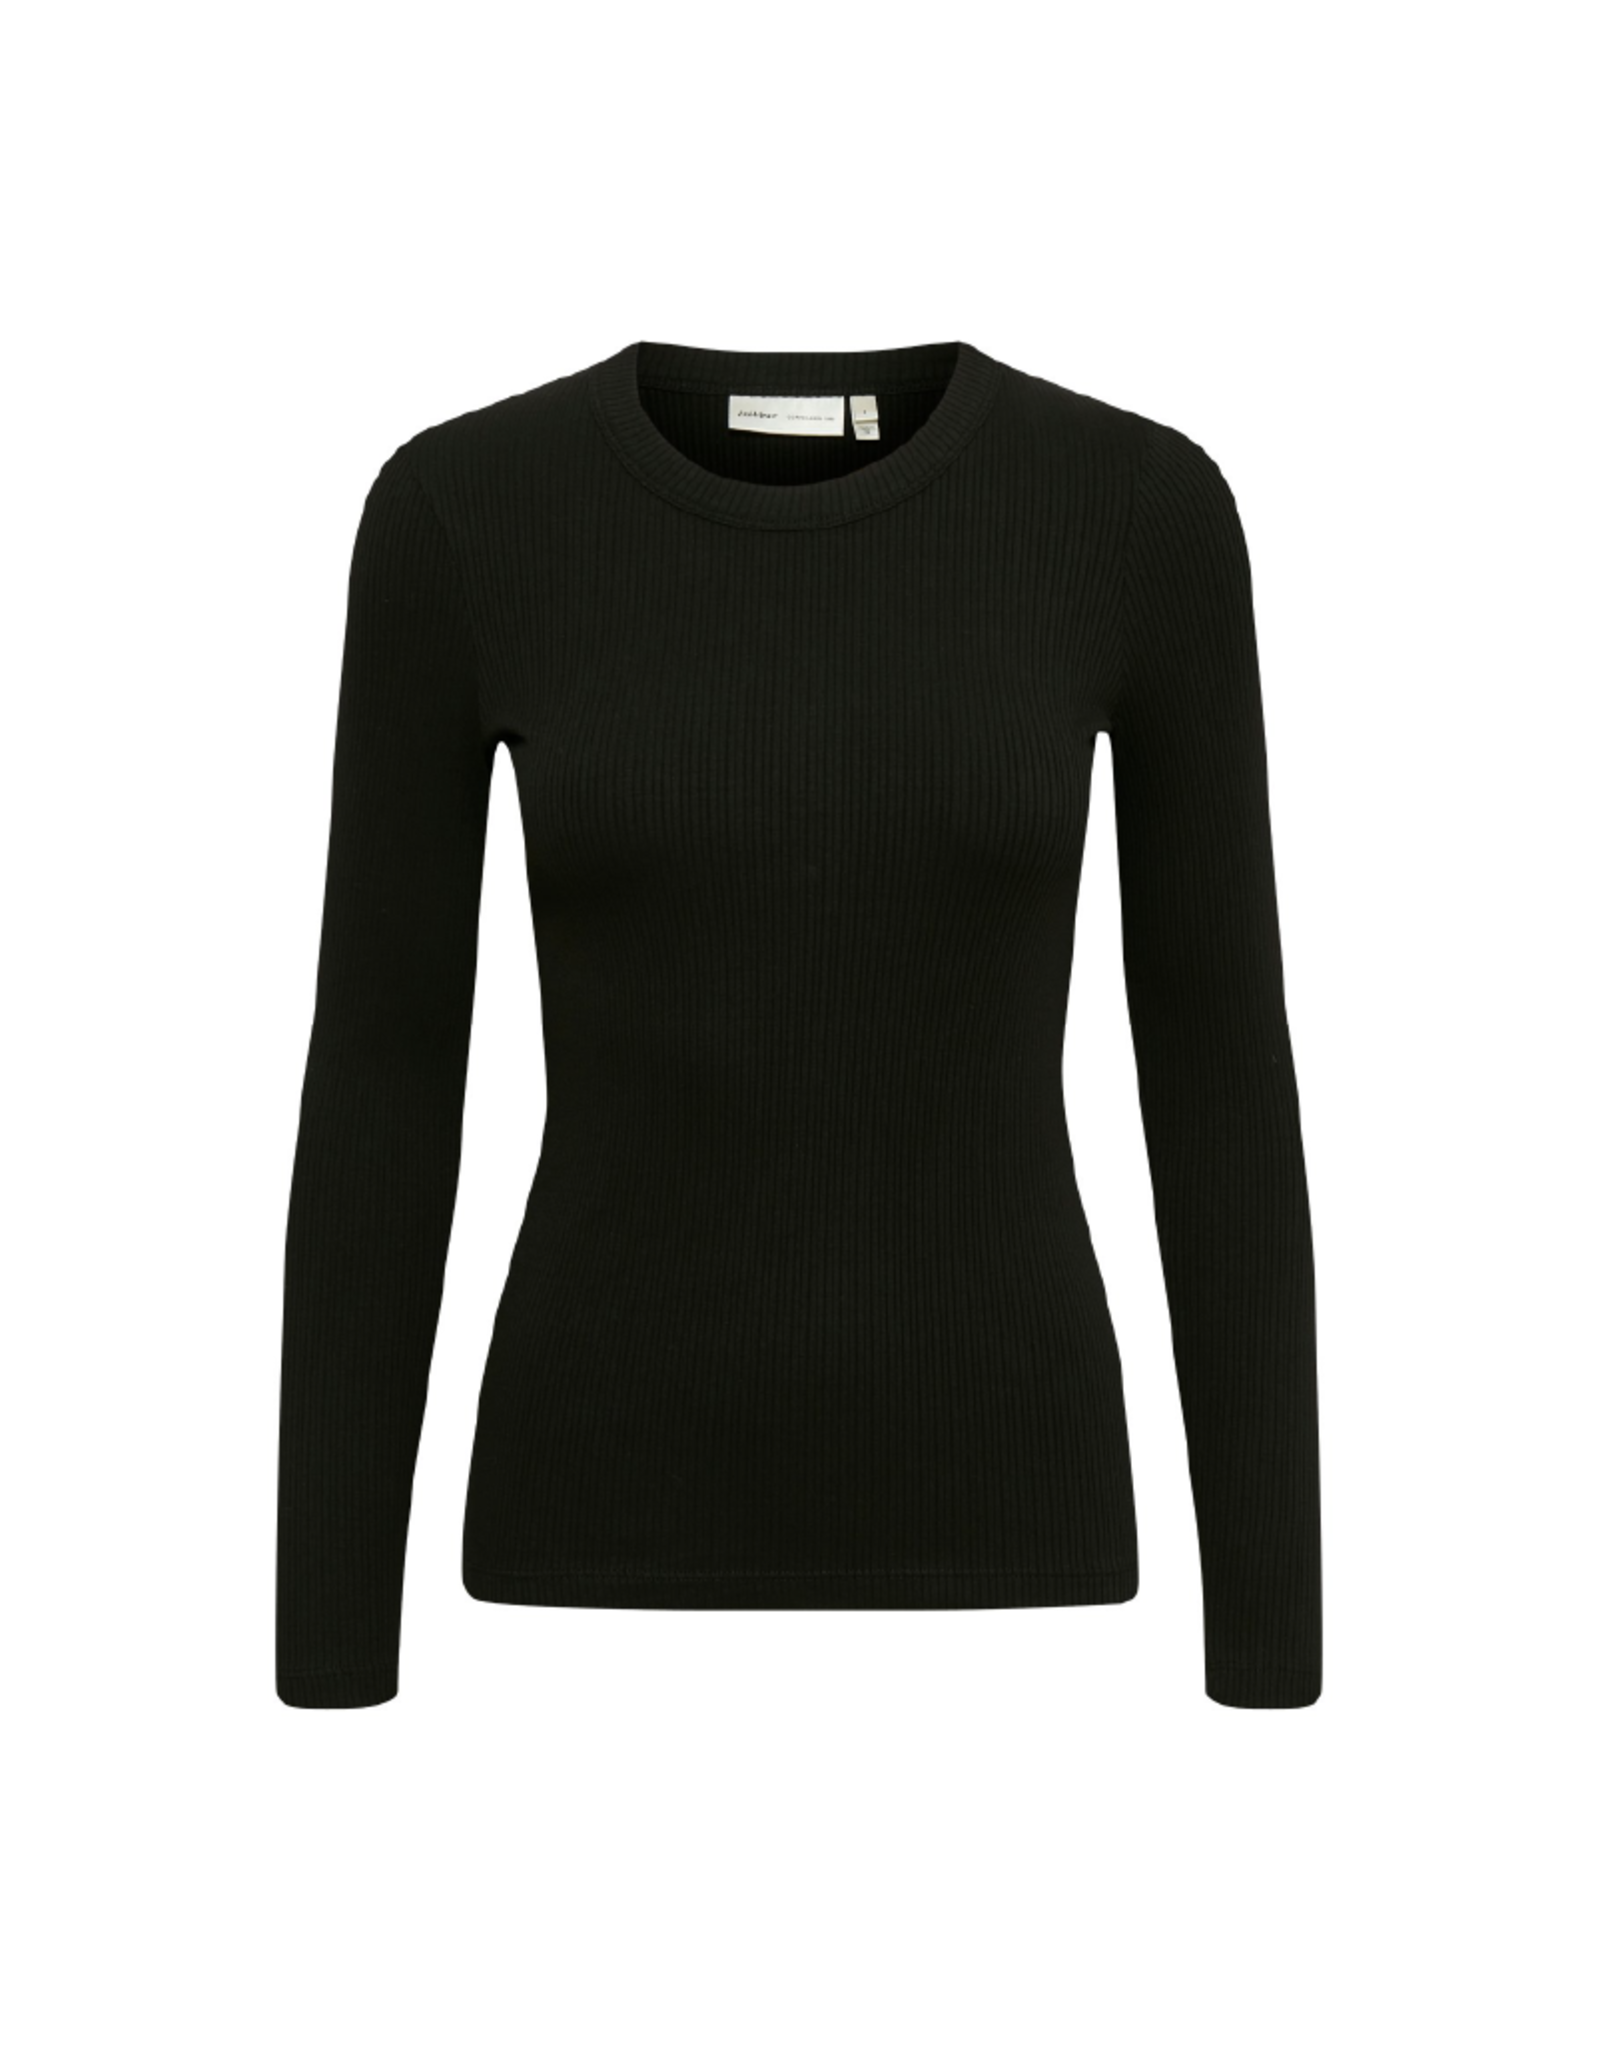 Inwear Dagna Crewneck Long-Sleeve Rib Top